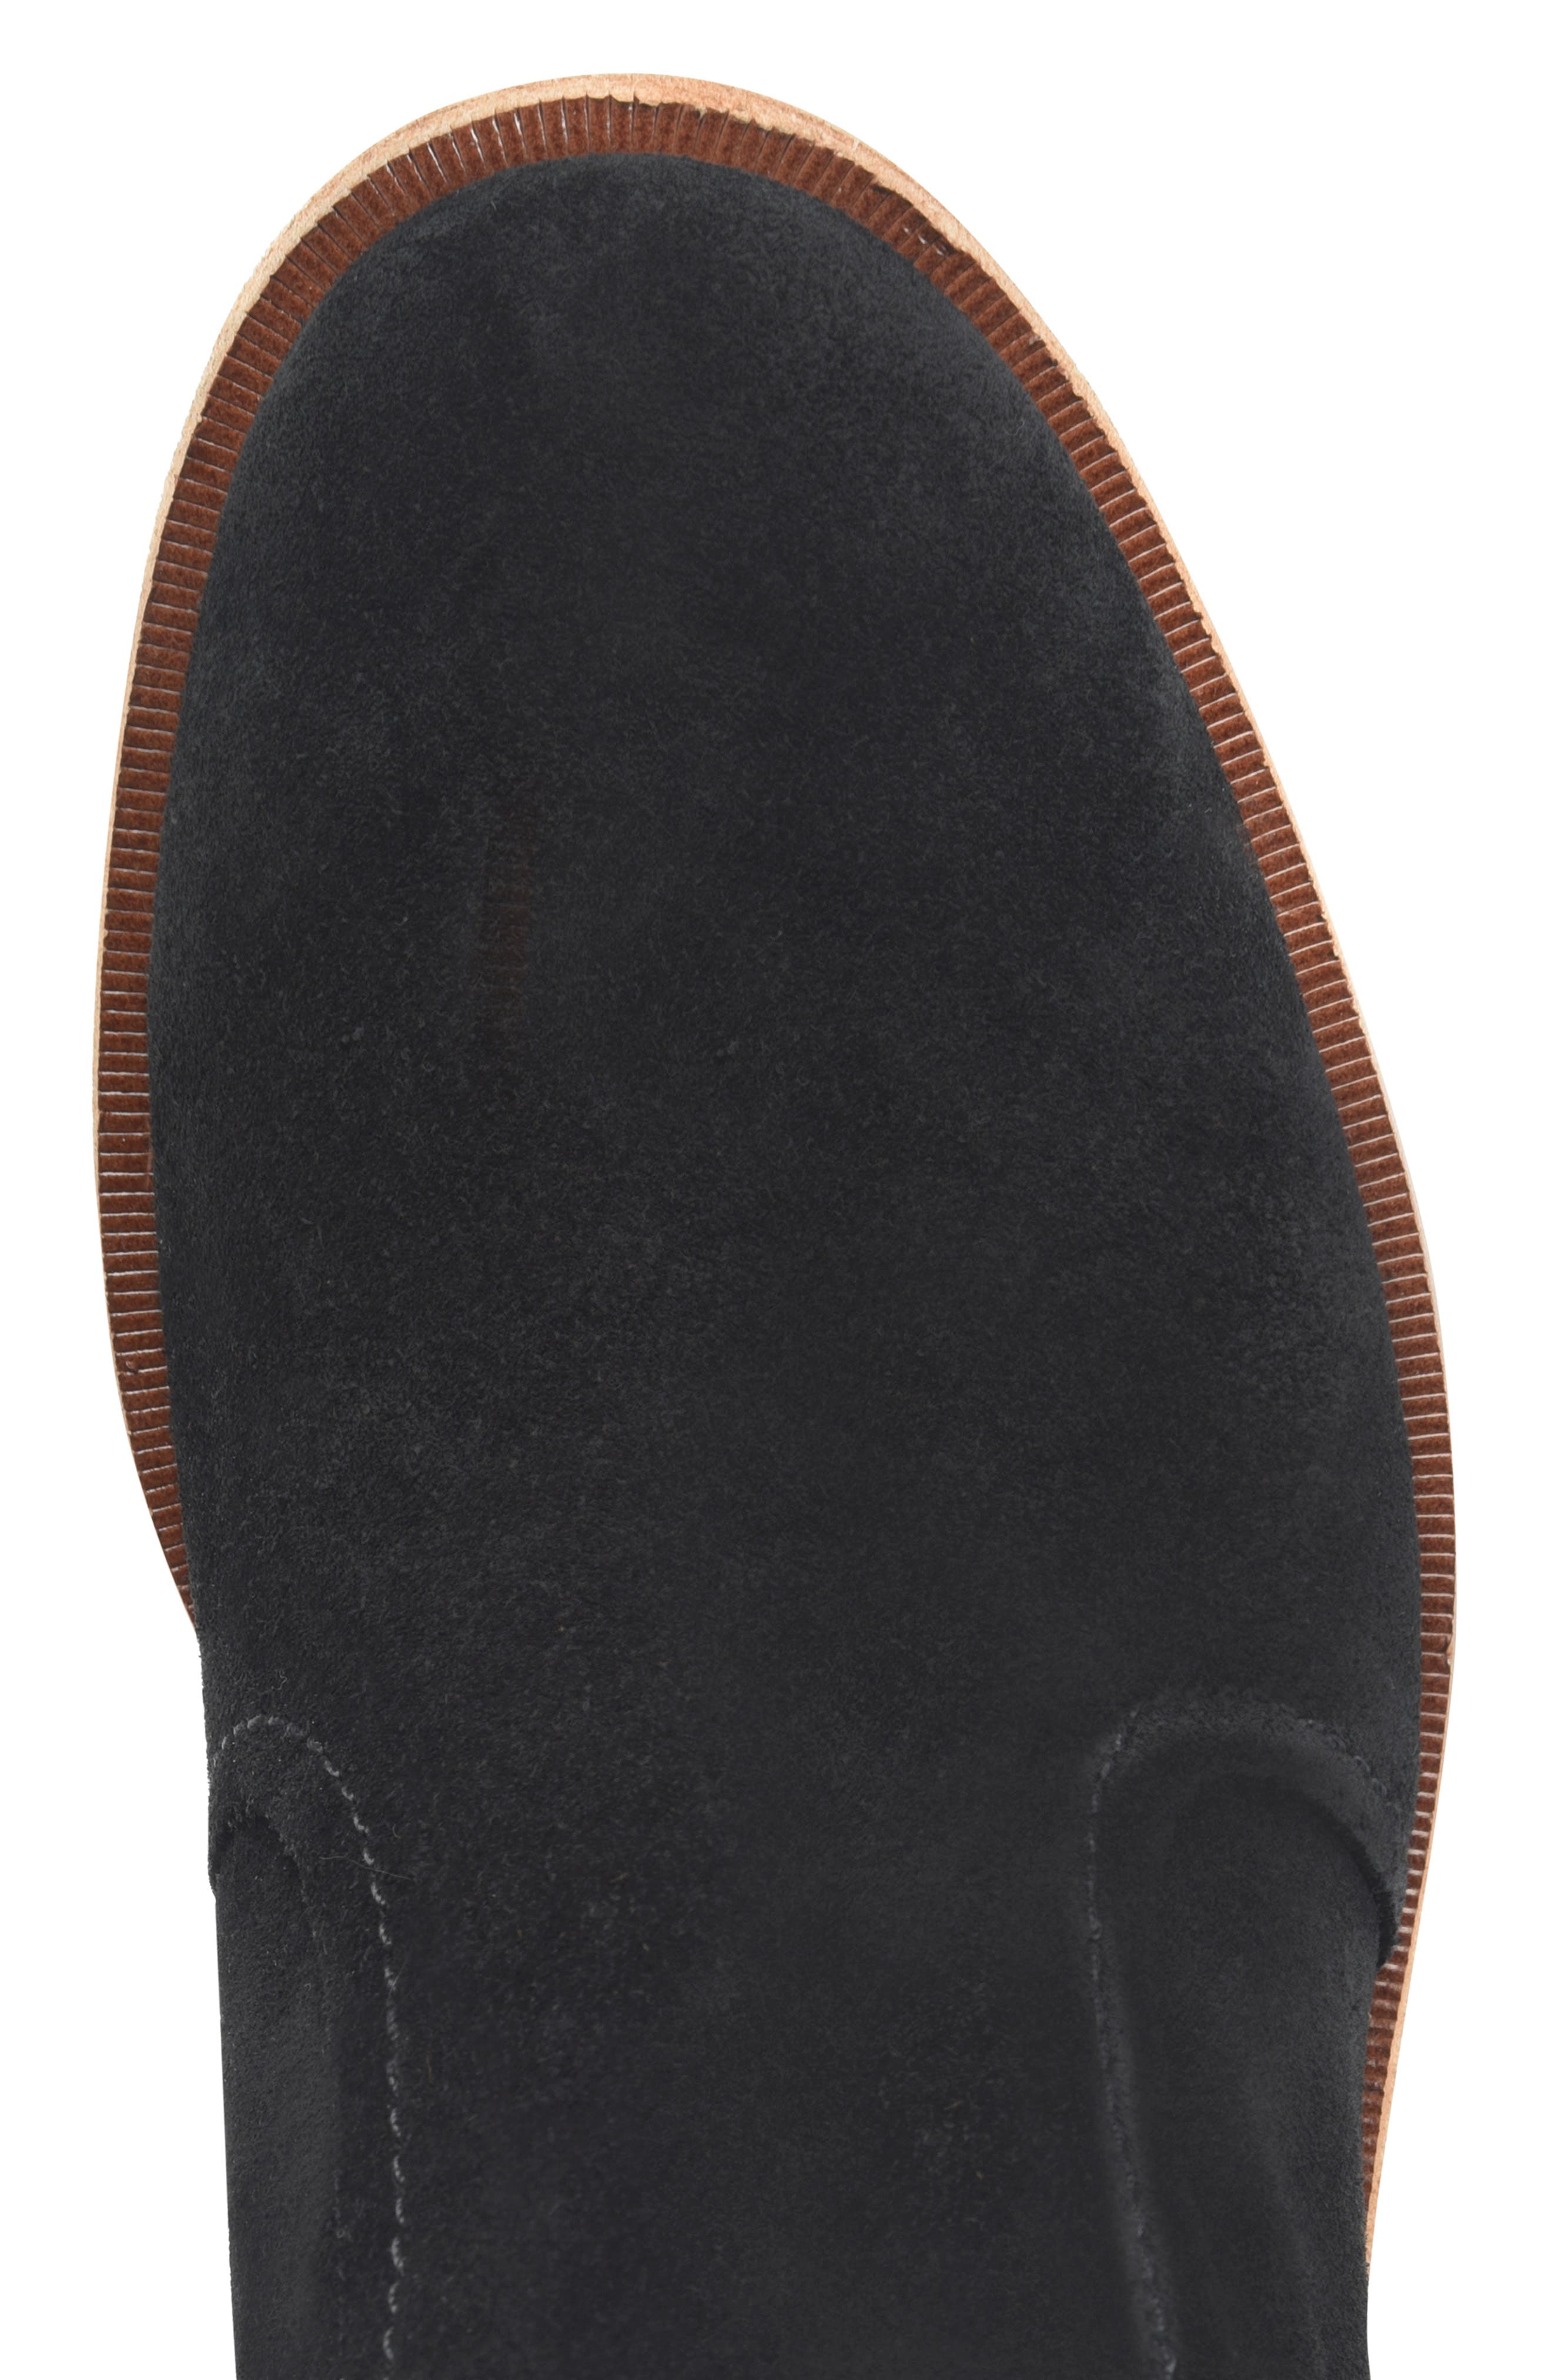 Jewel Boot,                             Alternate thumbnail 3, color,                             BLACK SUEDE